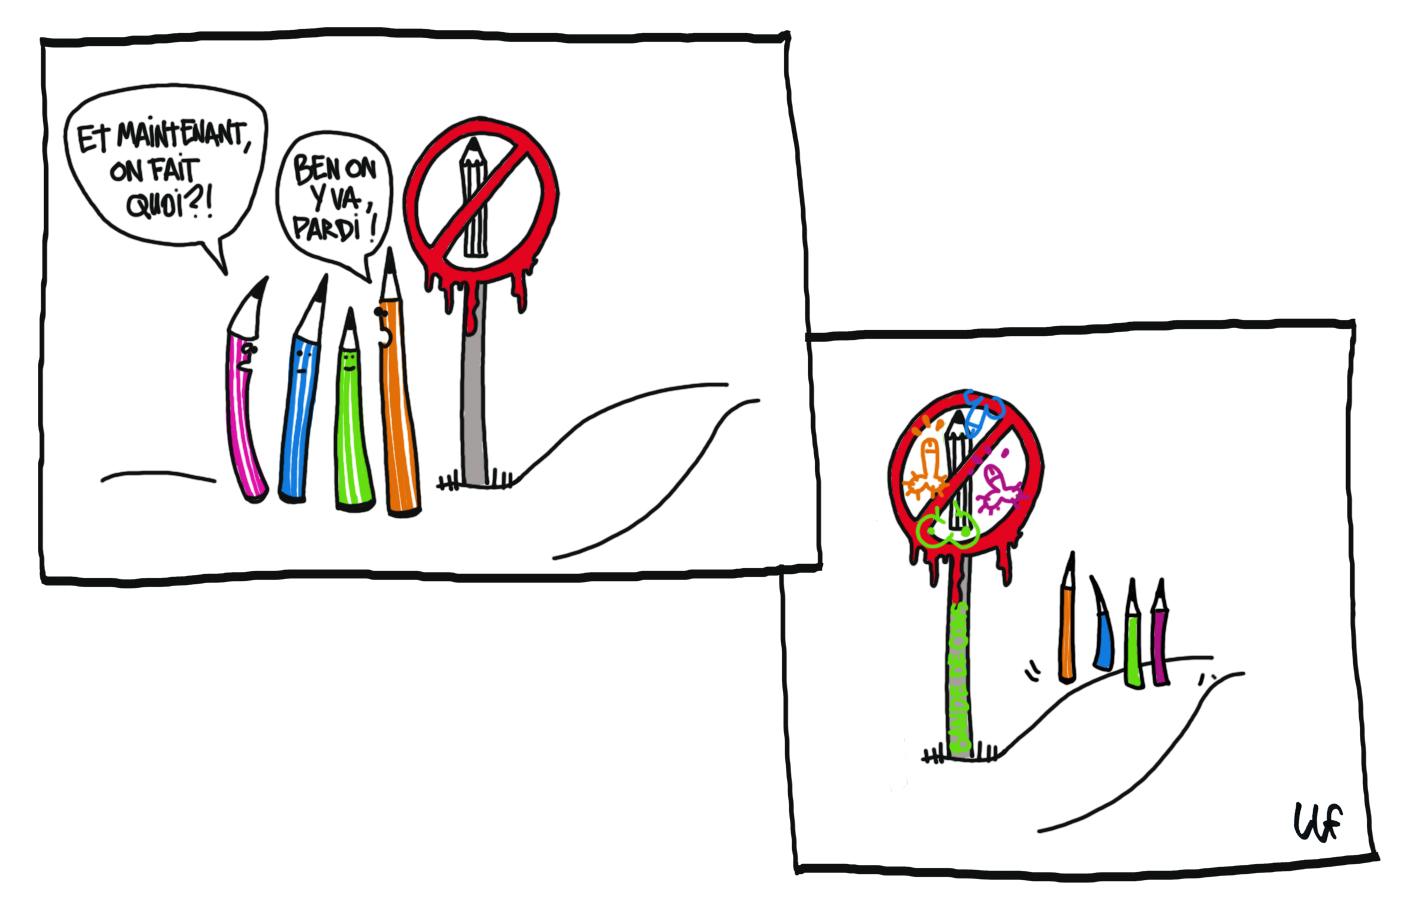 les-crayons-au-combat-charlie-hebdo-lilylafronde.jpg